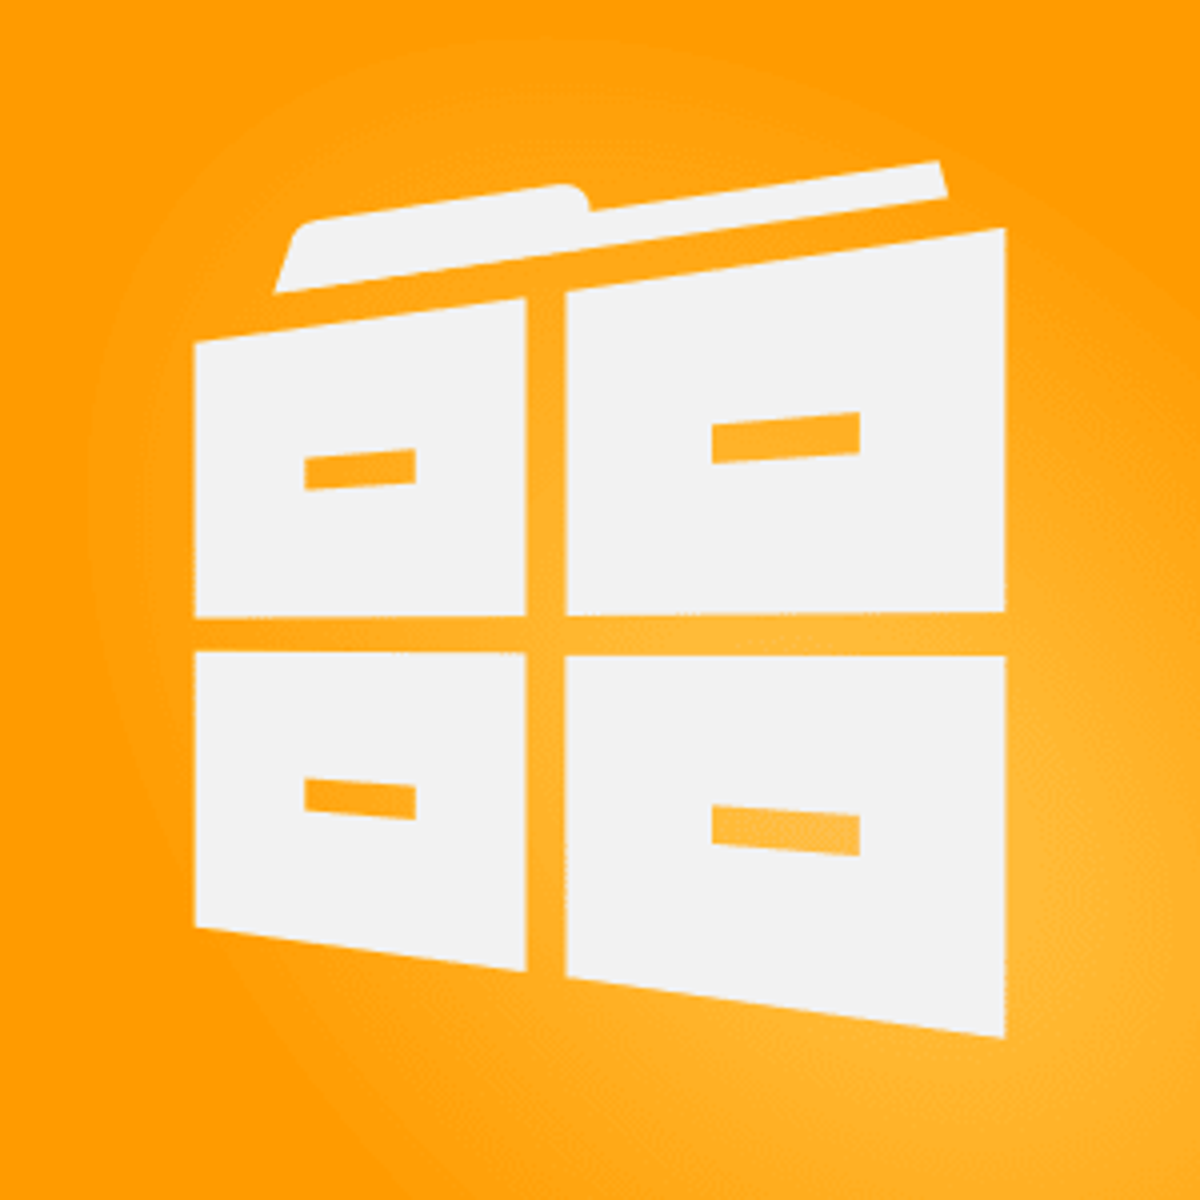 Aerize Explorer for Windows 10